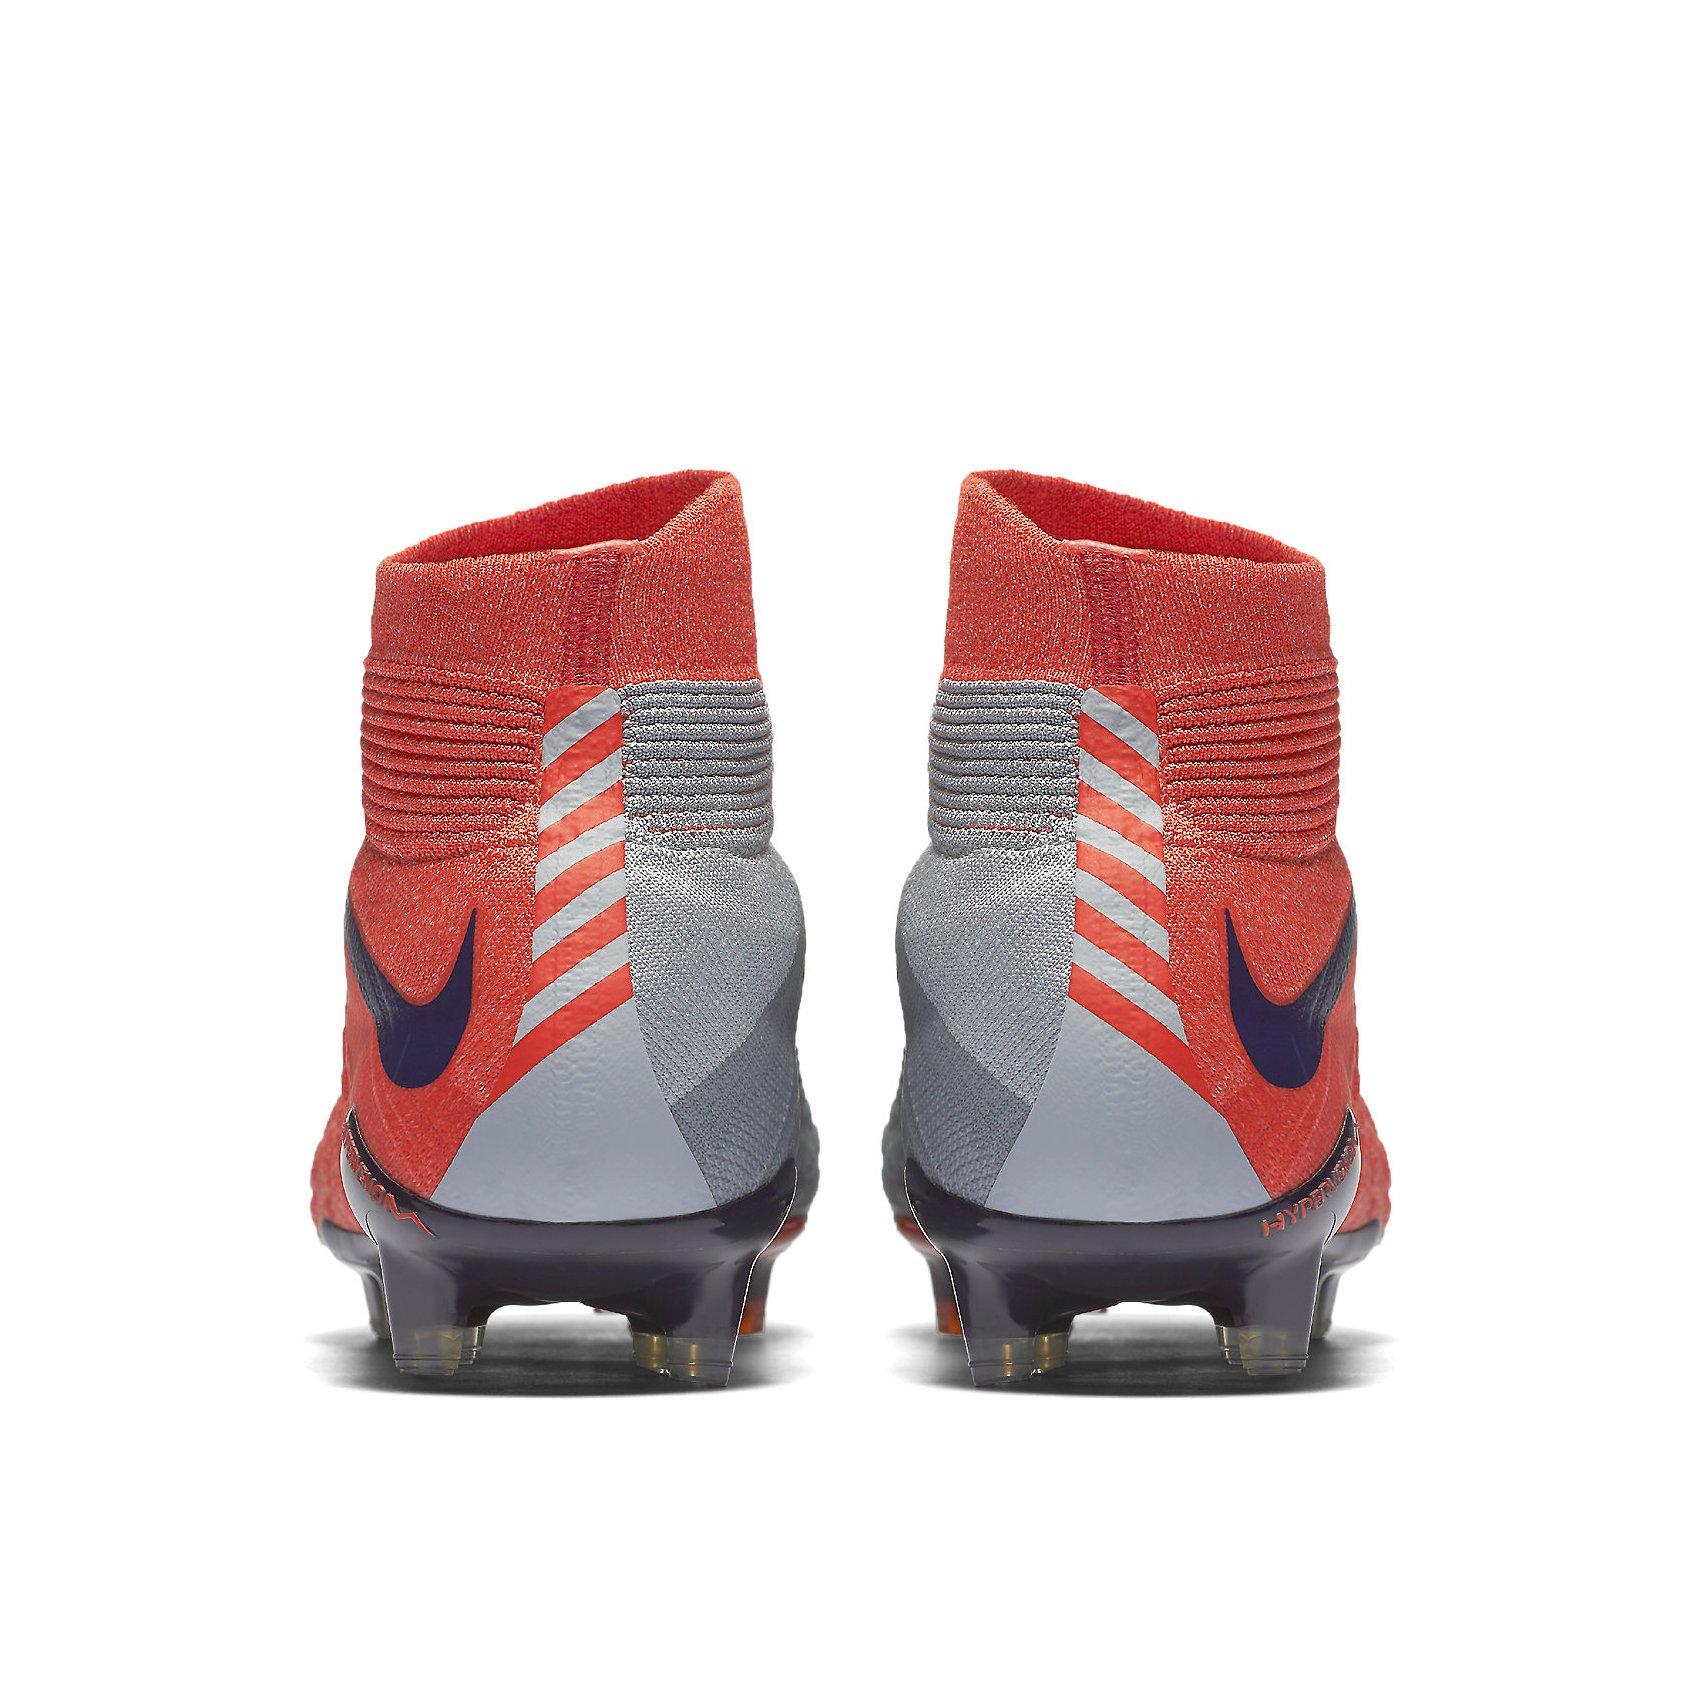 Nike Womens Hypervenom Phantom III Dynamic Fit FG Cleats [Wolf Grey] (8.5) by NIKE (Image #4)